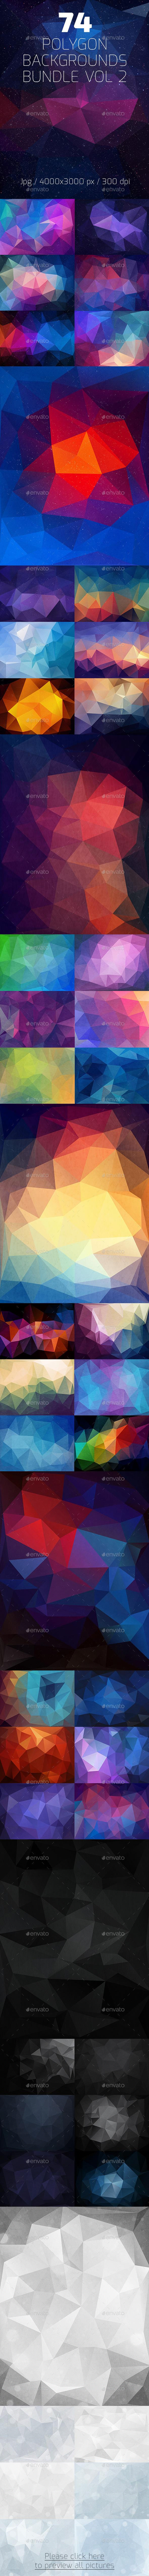 GraphicRiver 74 Polygon Backgrounds Bundle Vol 2 10491741